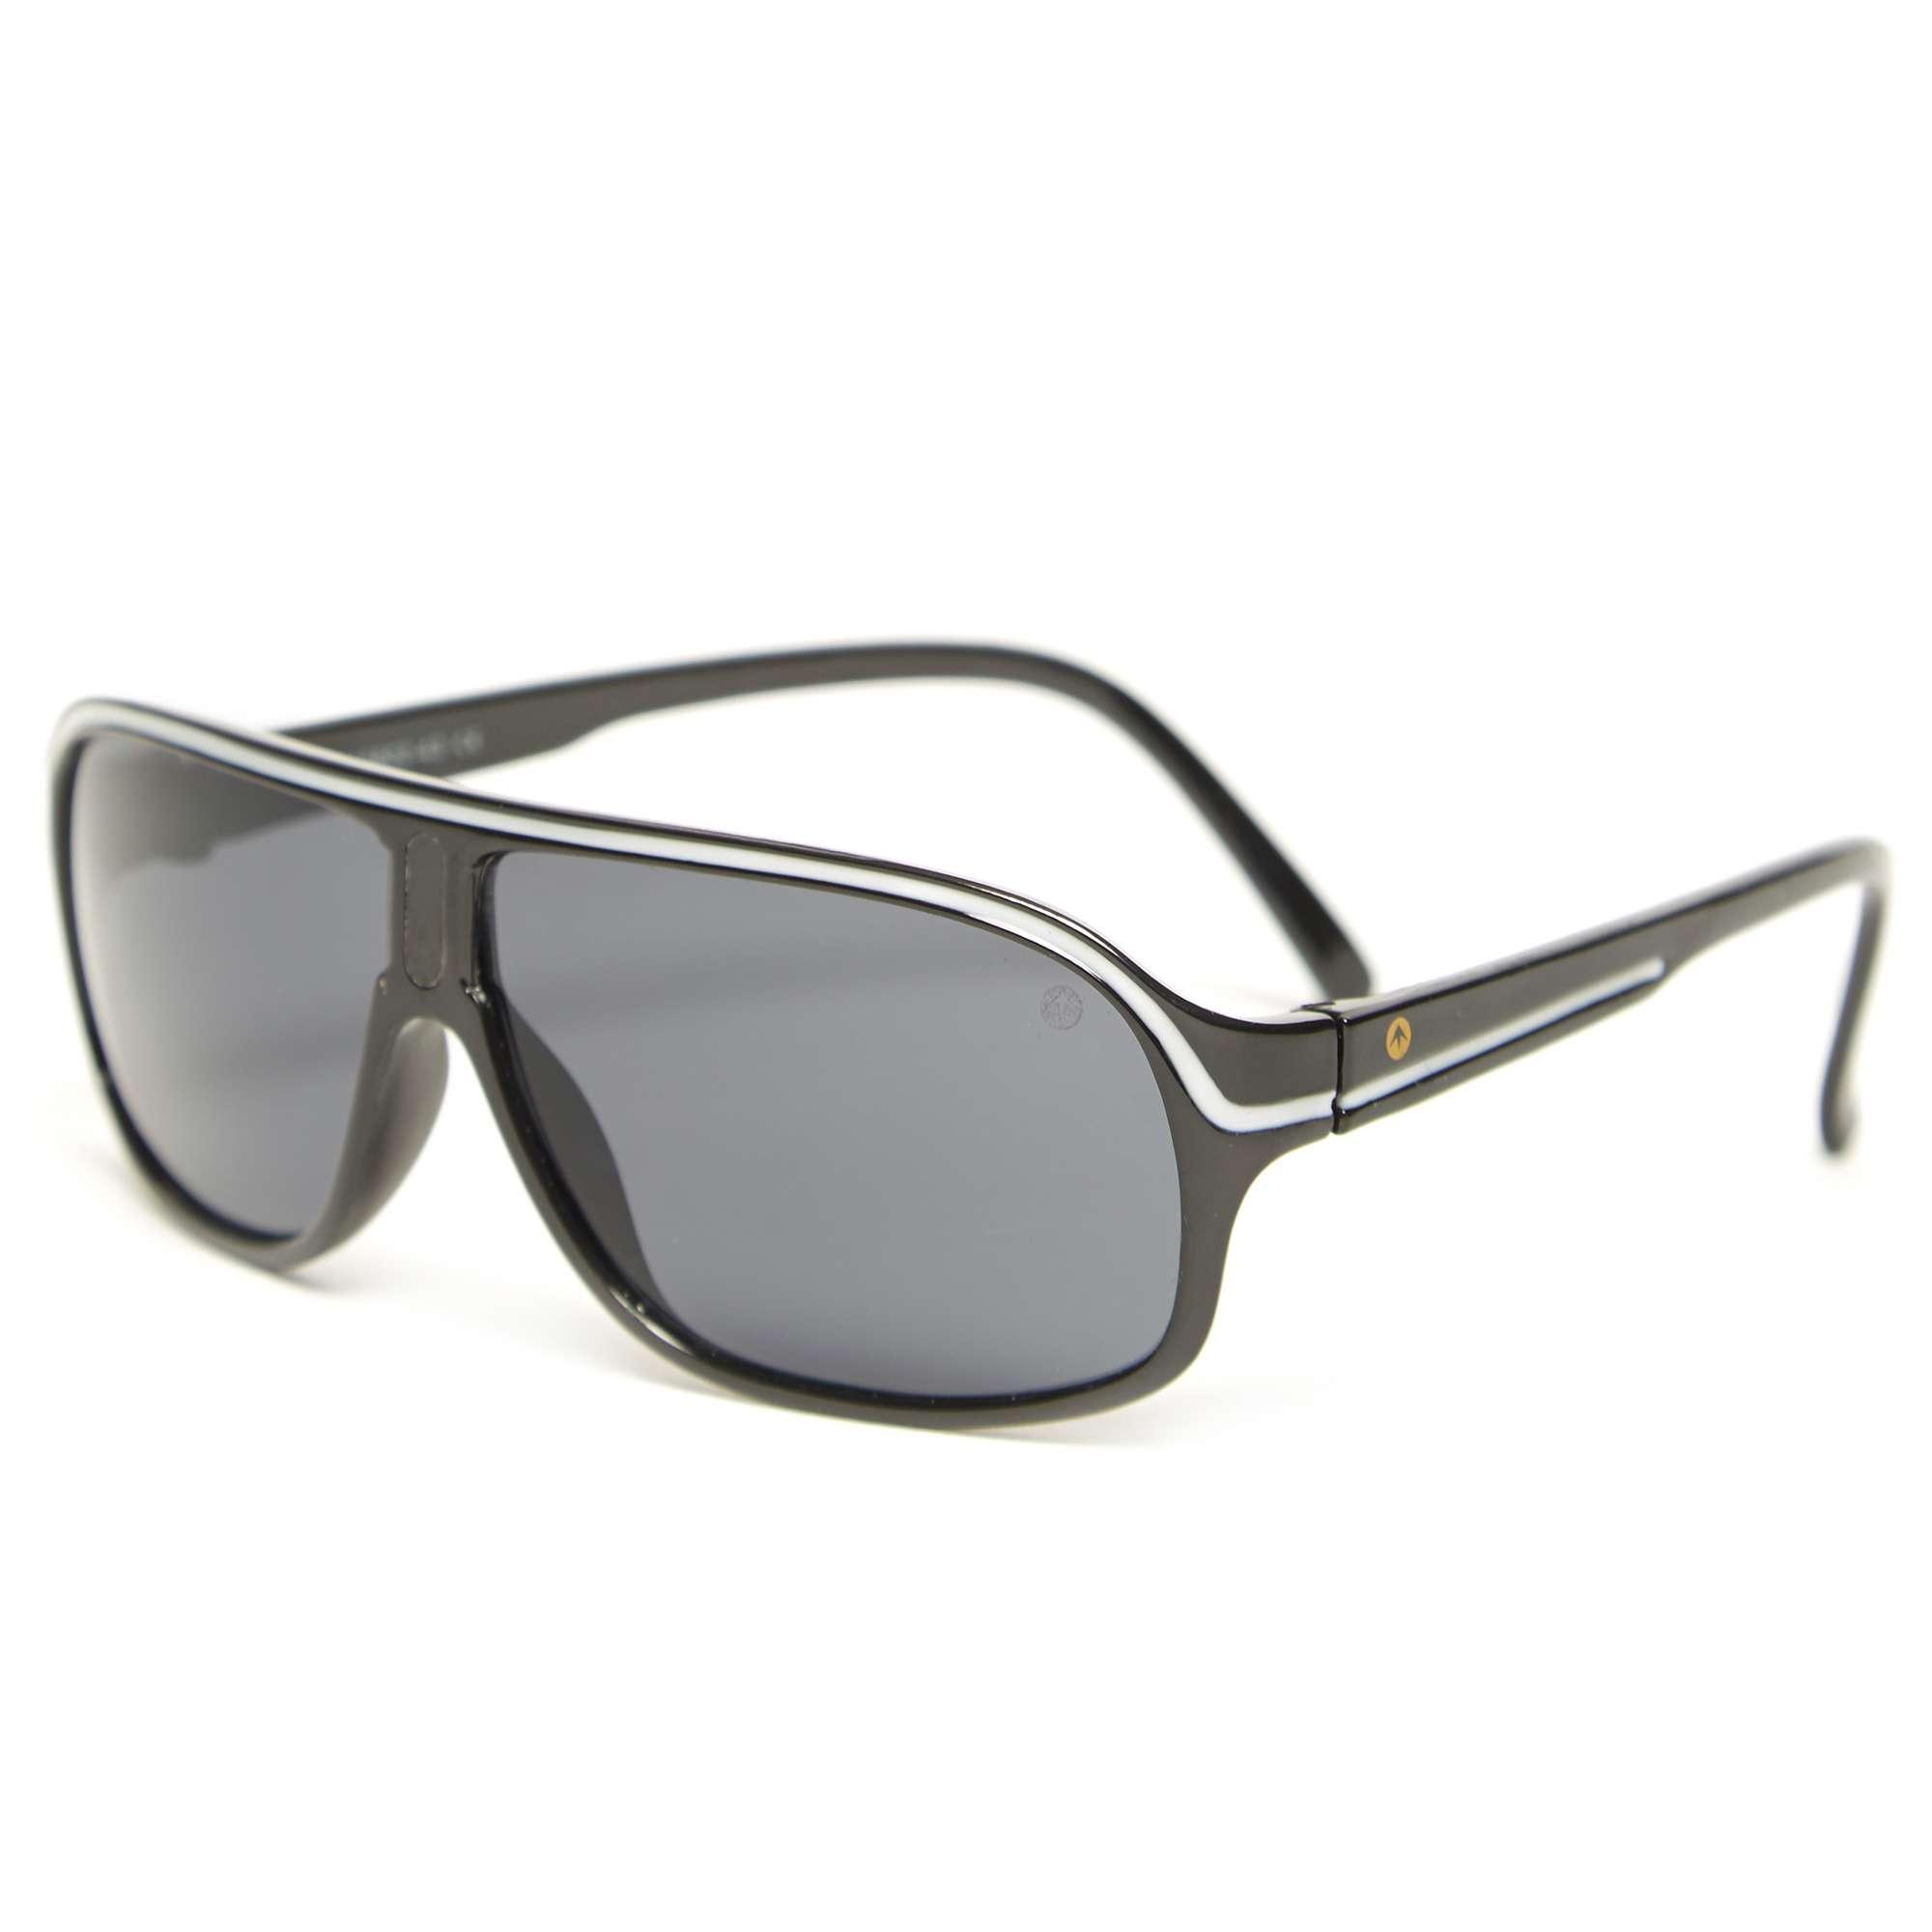 BLACKS Boys' Line Sunglasses